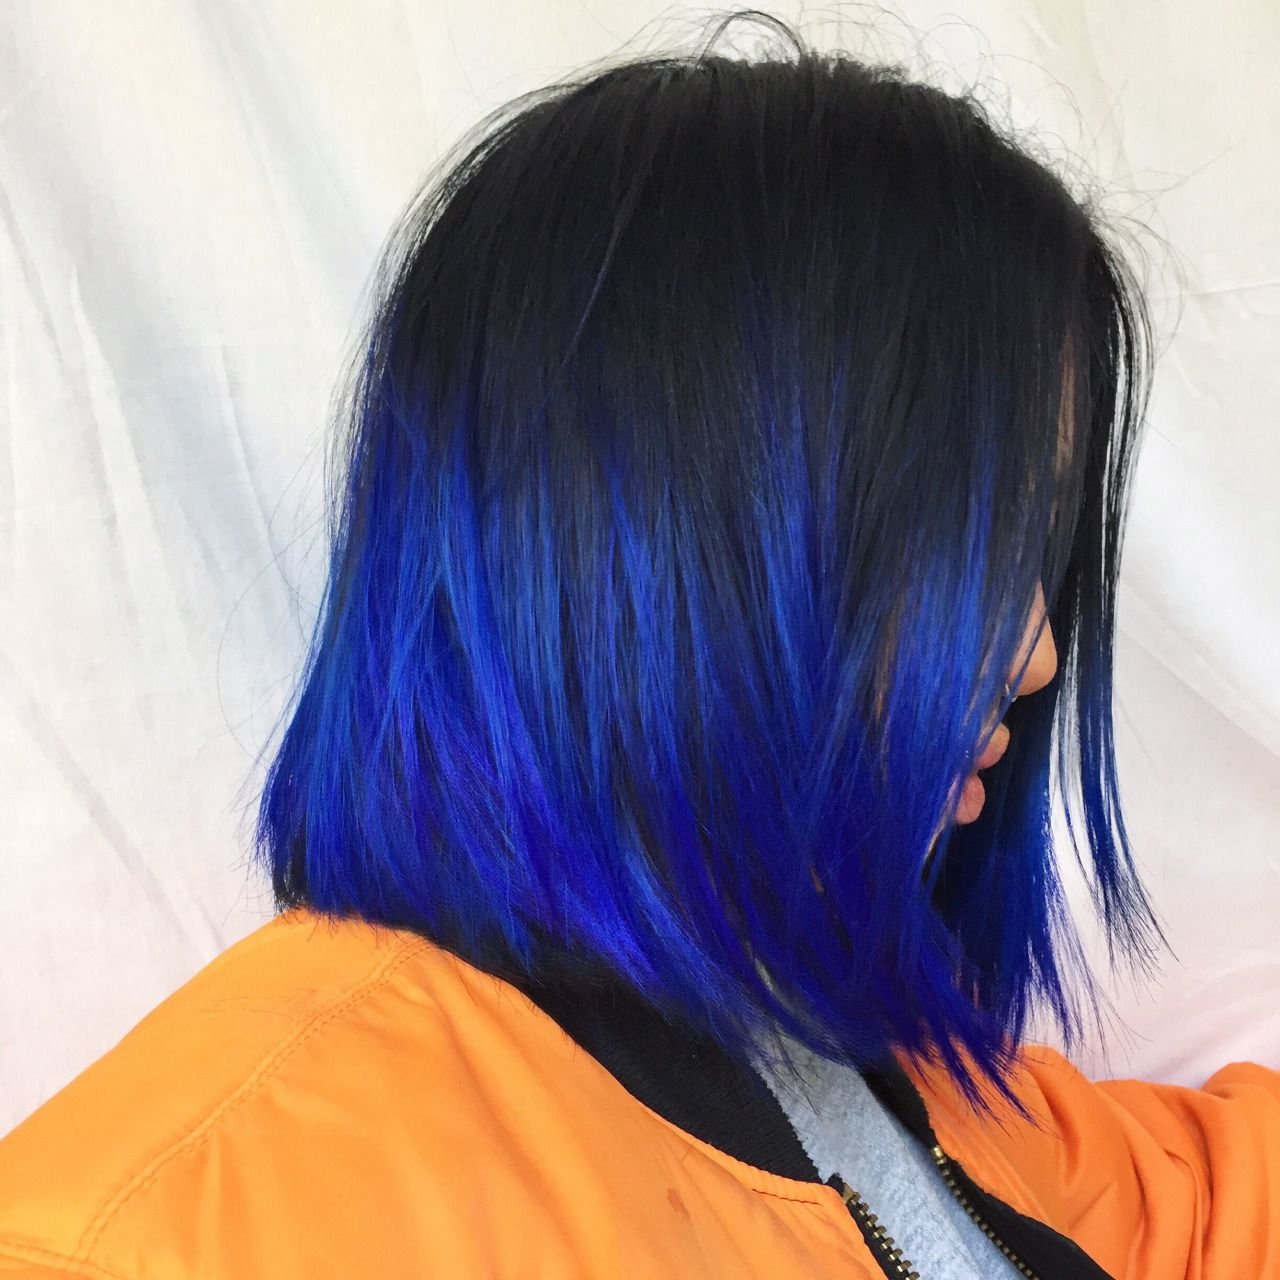 38 Tumblr Hair Pinterest Hair Coloring Dye Hair And Makeup